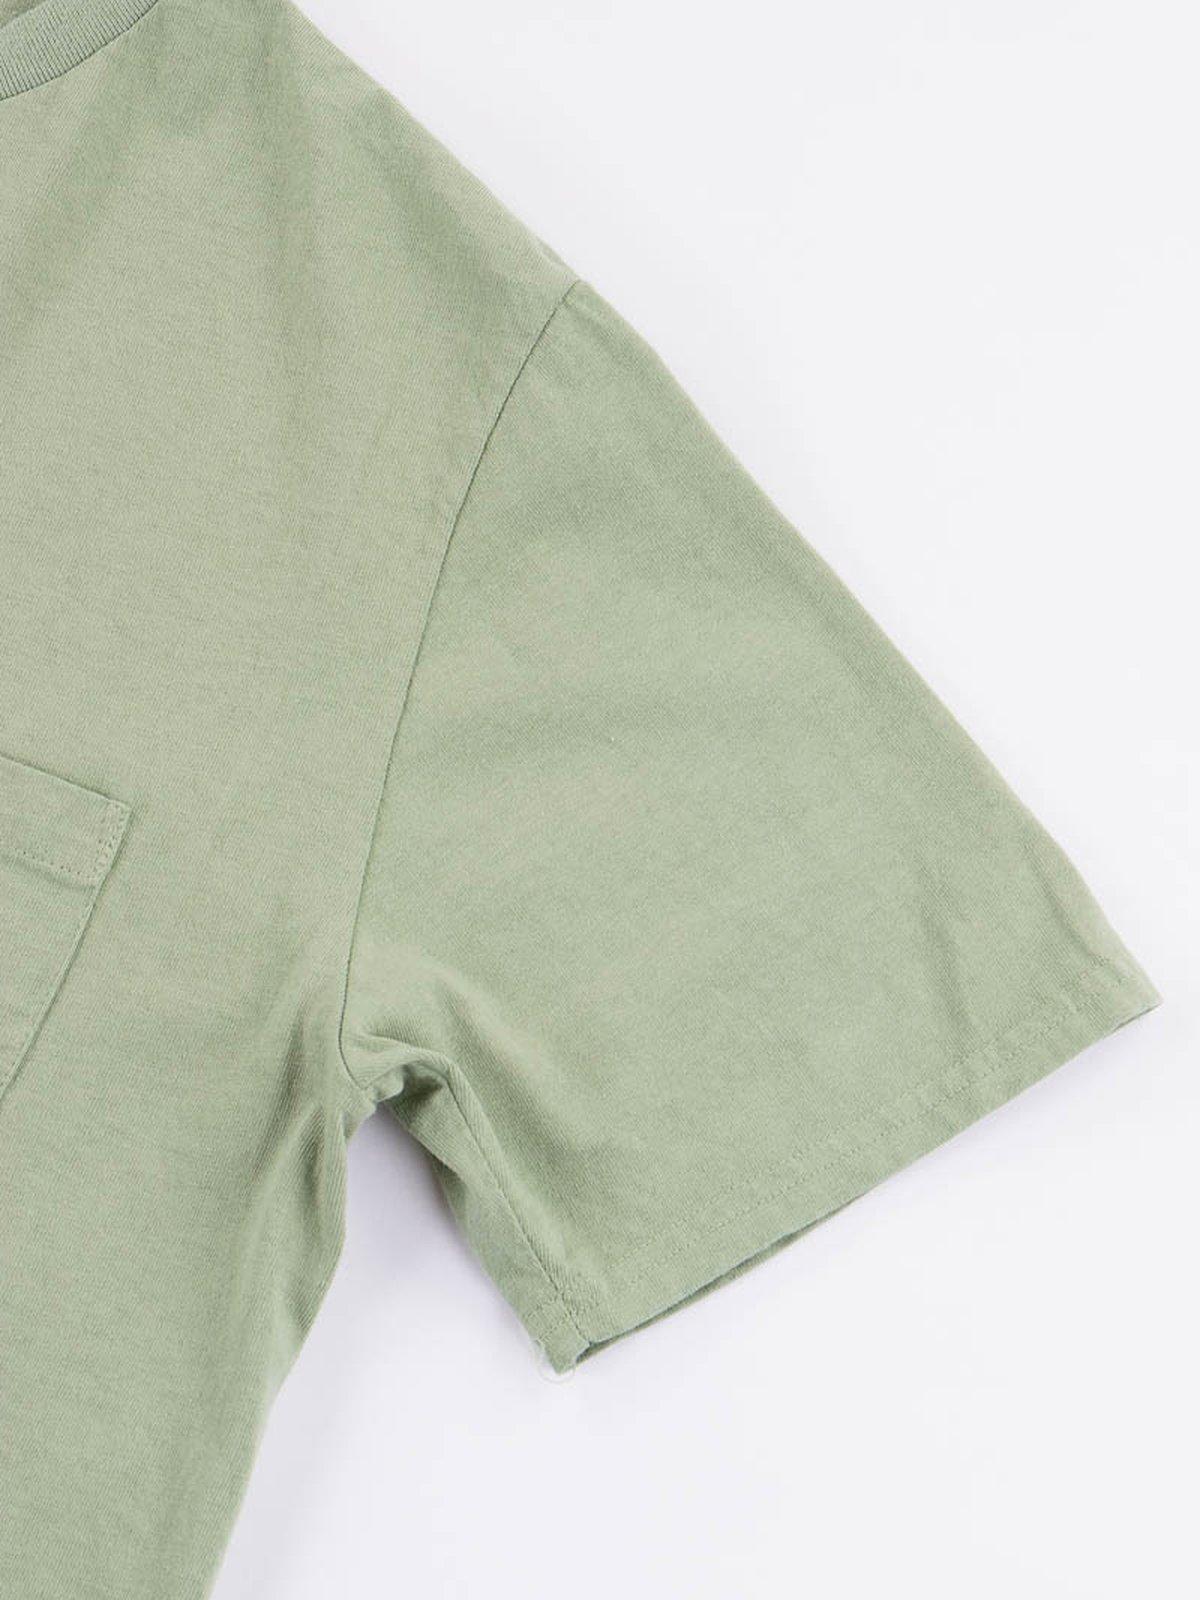 Green Standard Pack Pocket Tee - Image 4